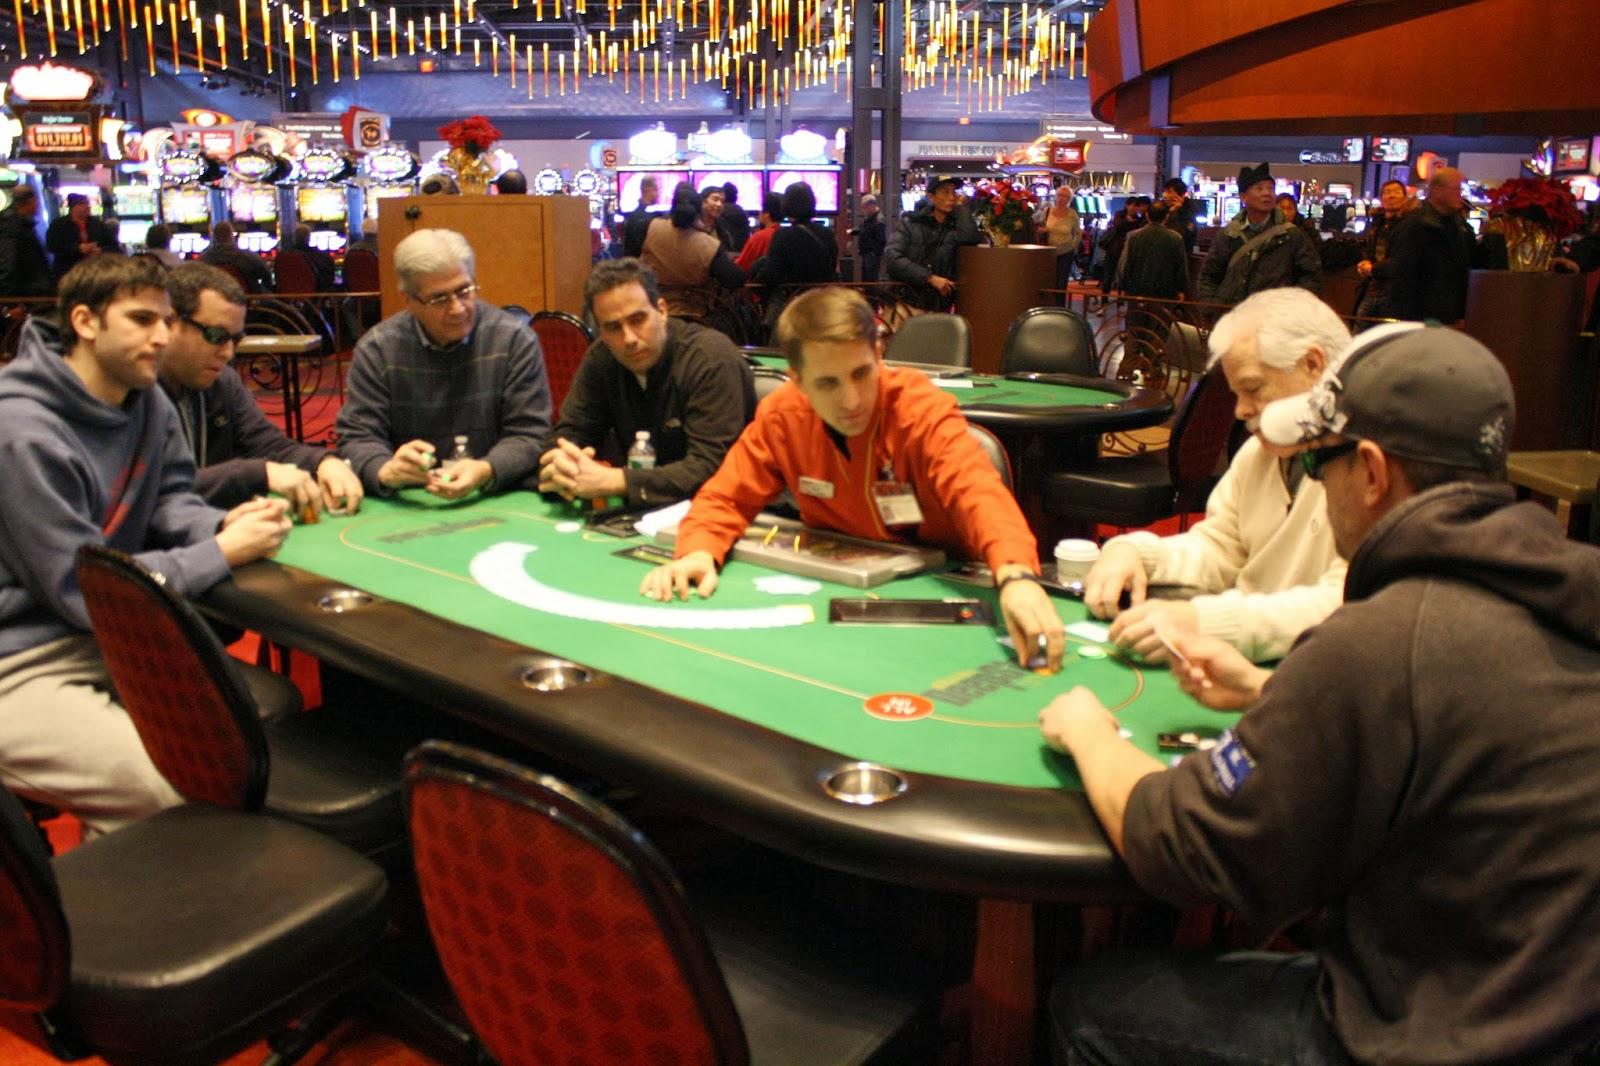 analyzing gambling habits